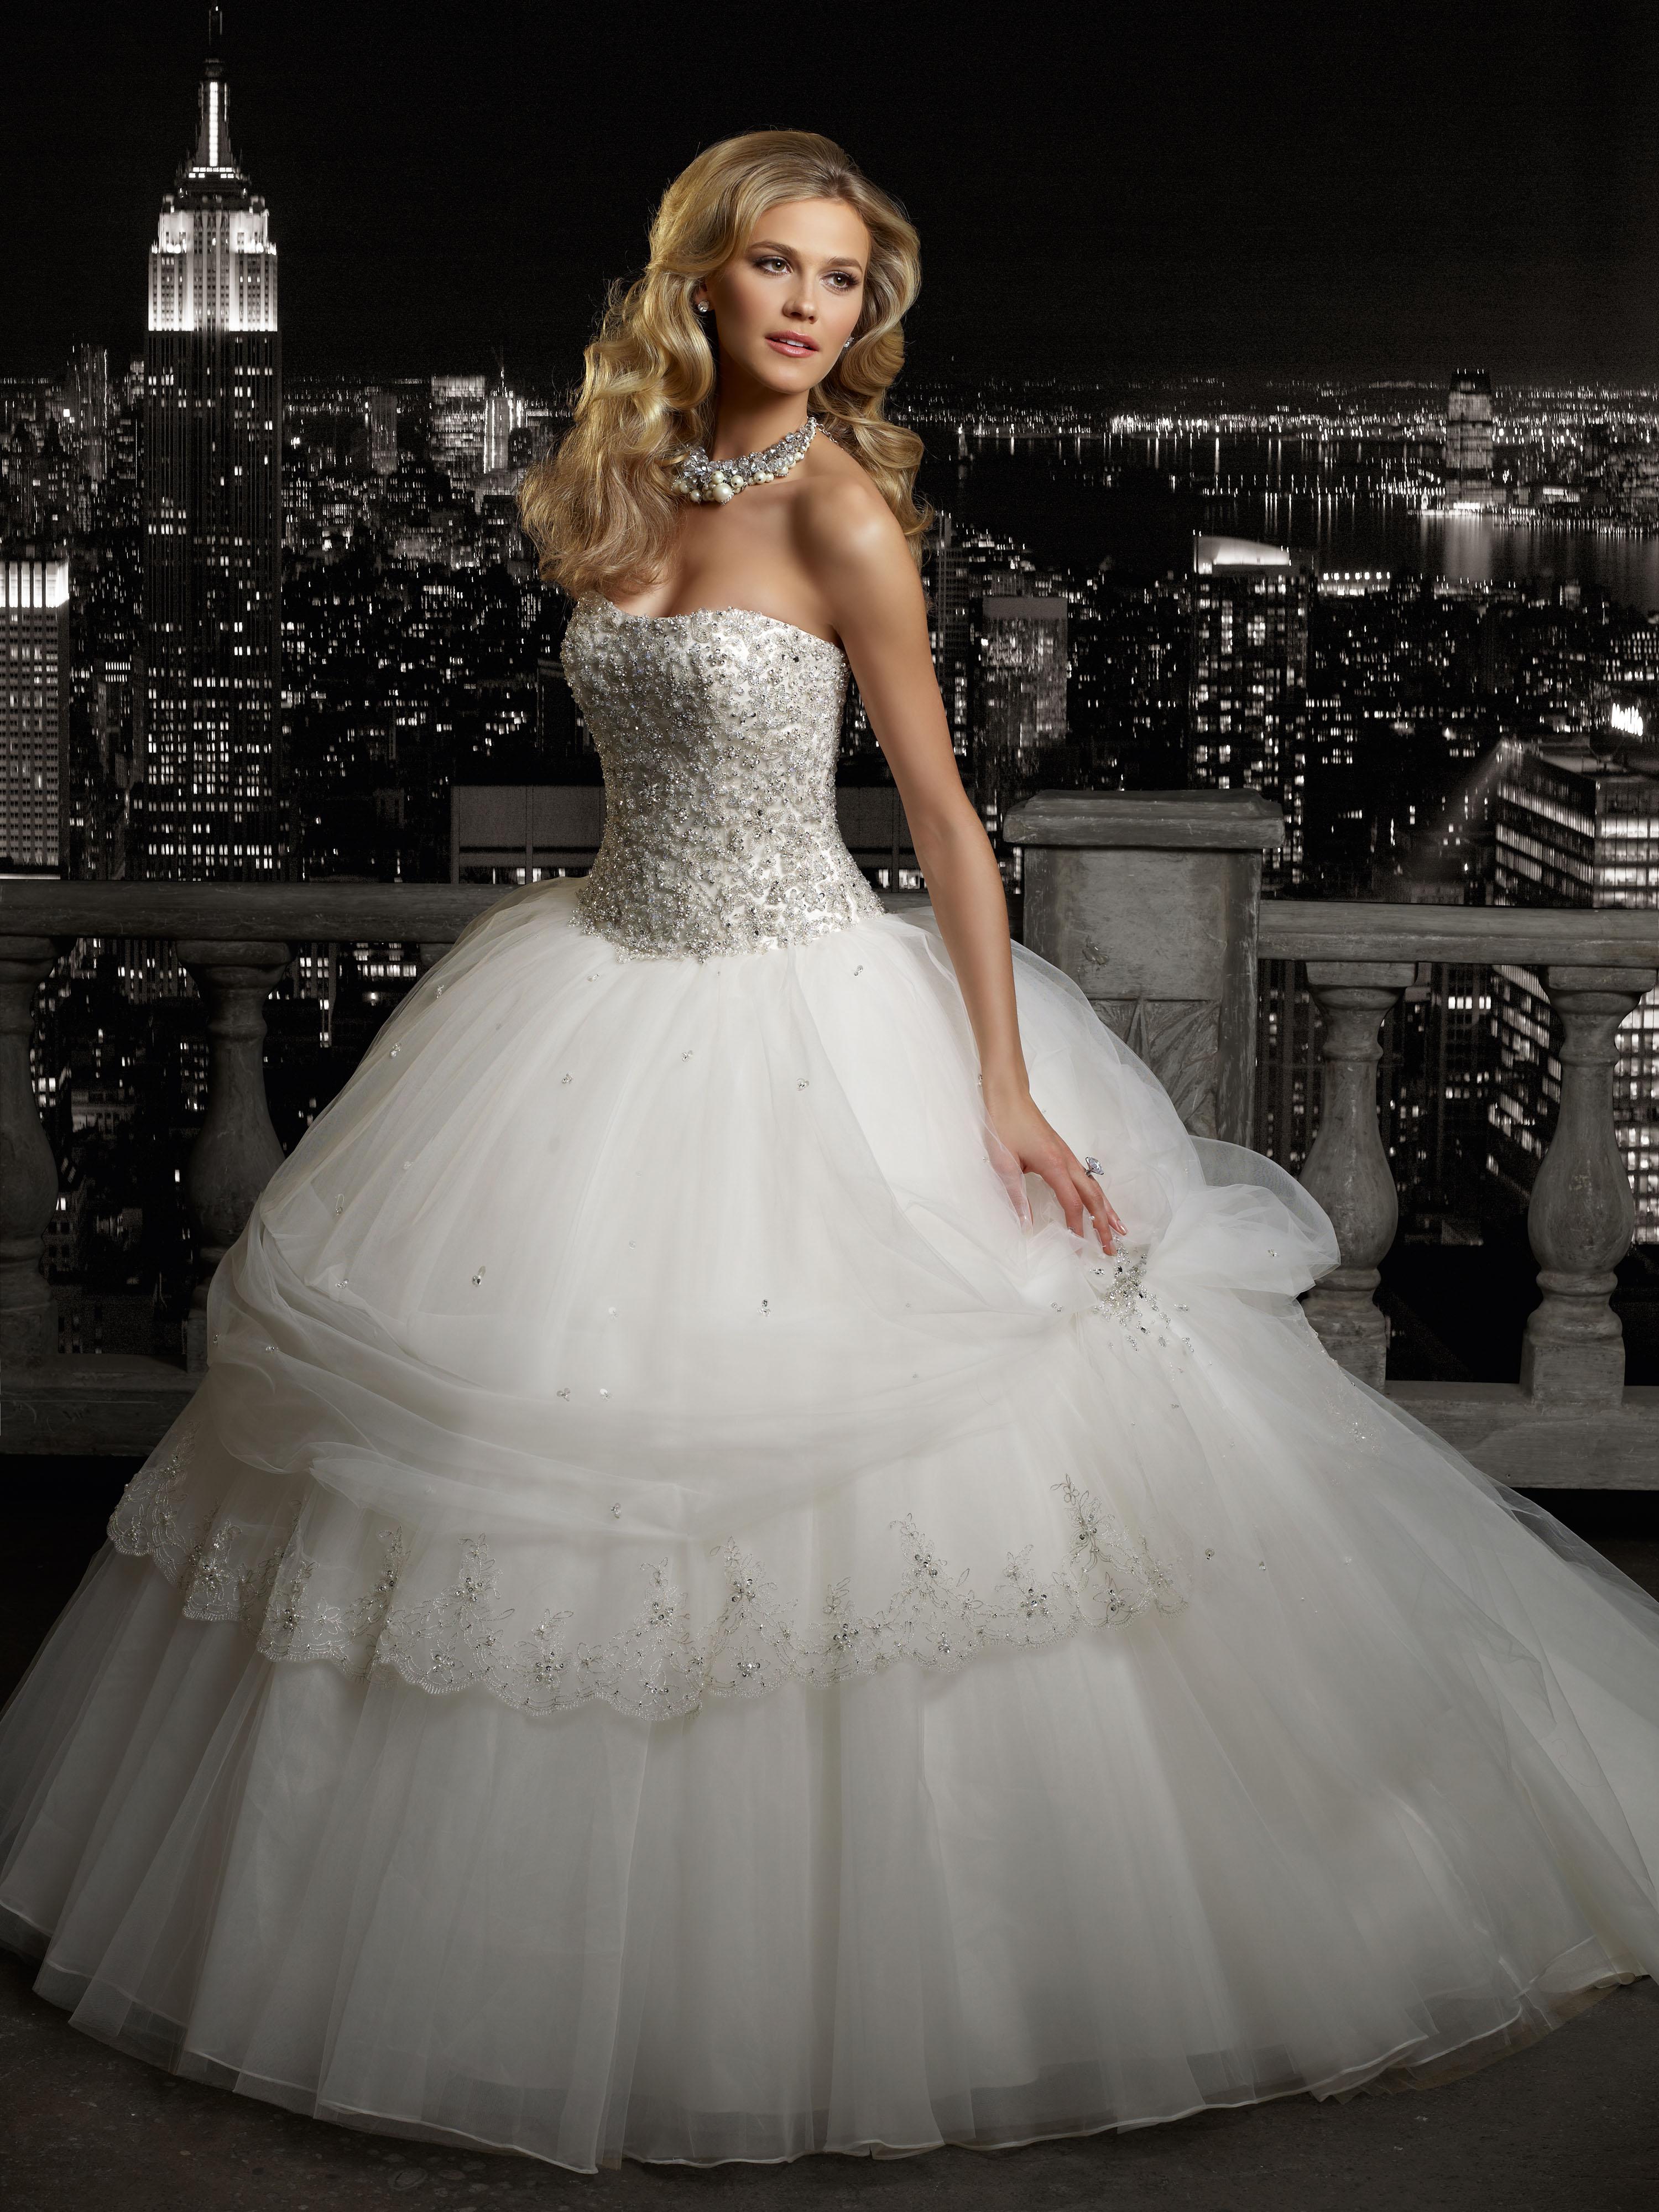 Bridal Boutique Walsall | Wedding Dress Shops - Walsall, West ...